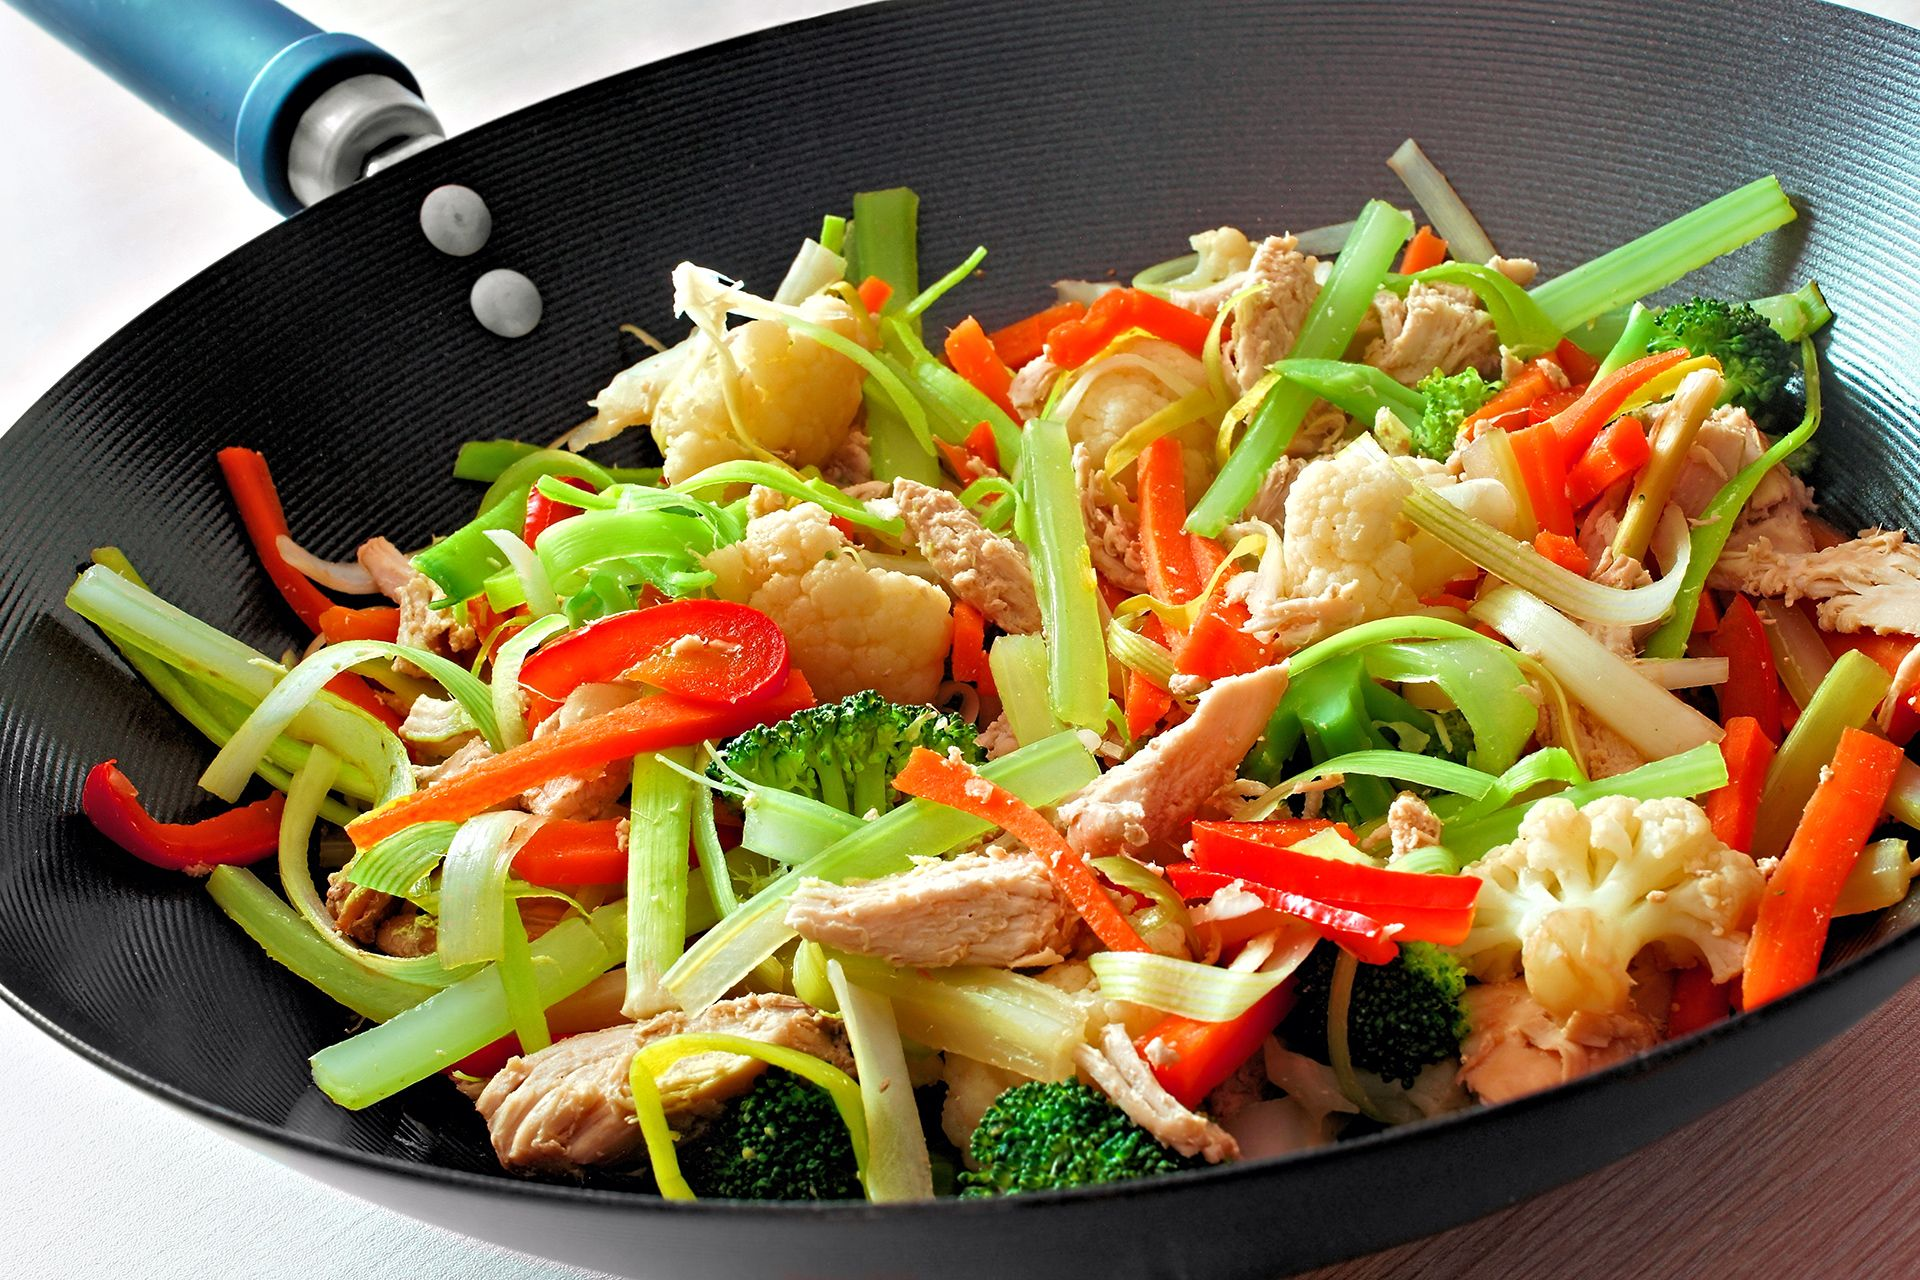 Asiatische Küche catering asiatische küche